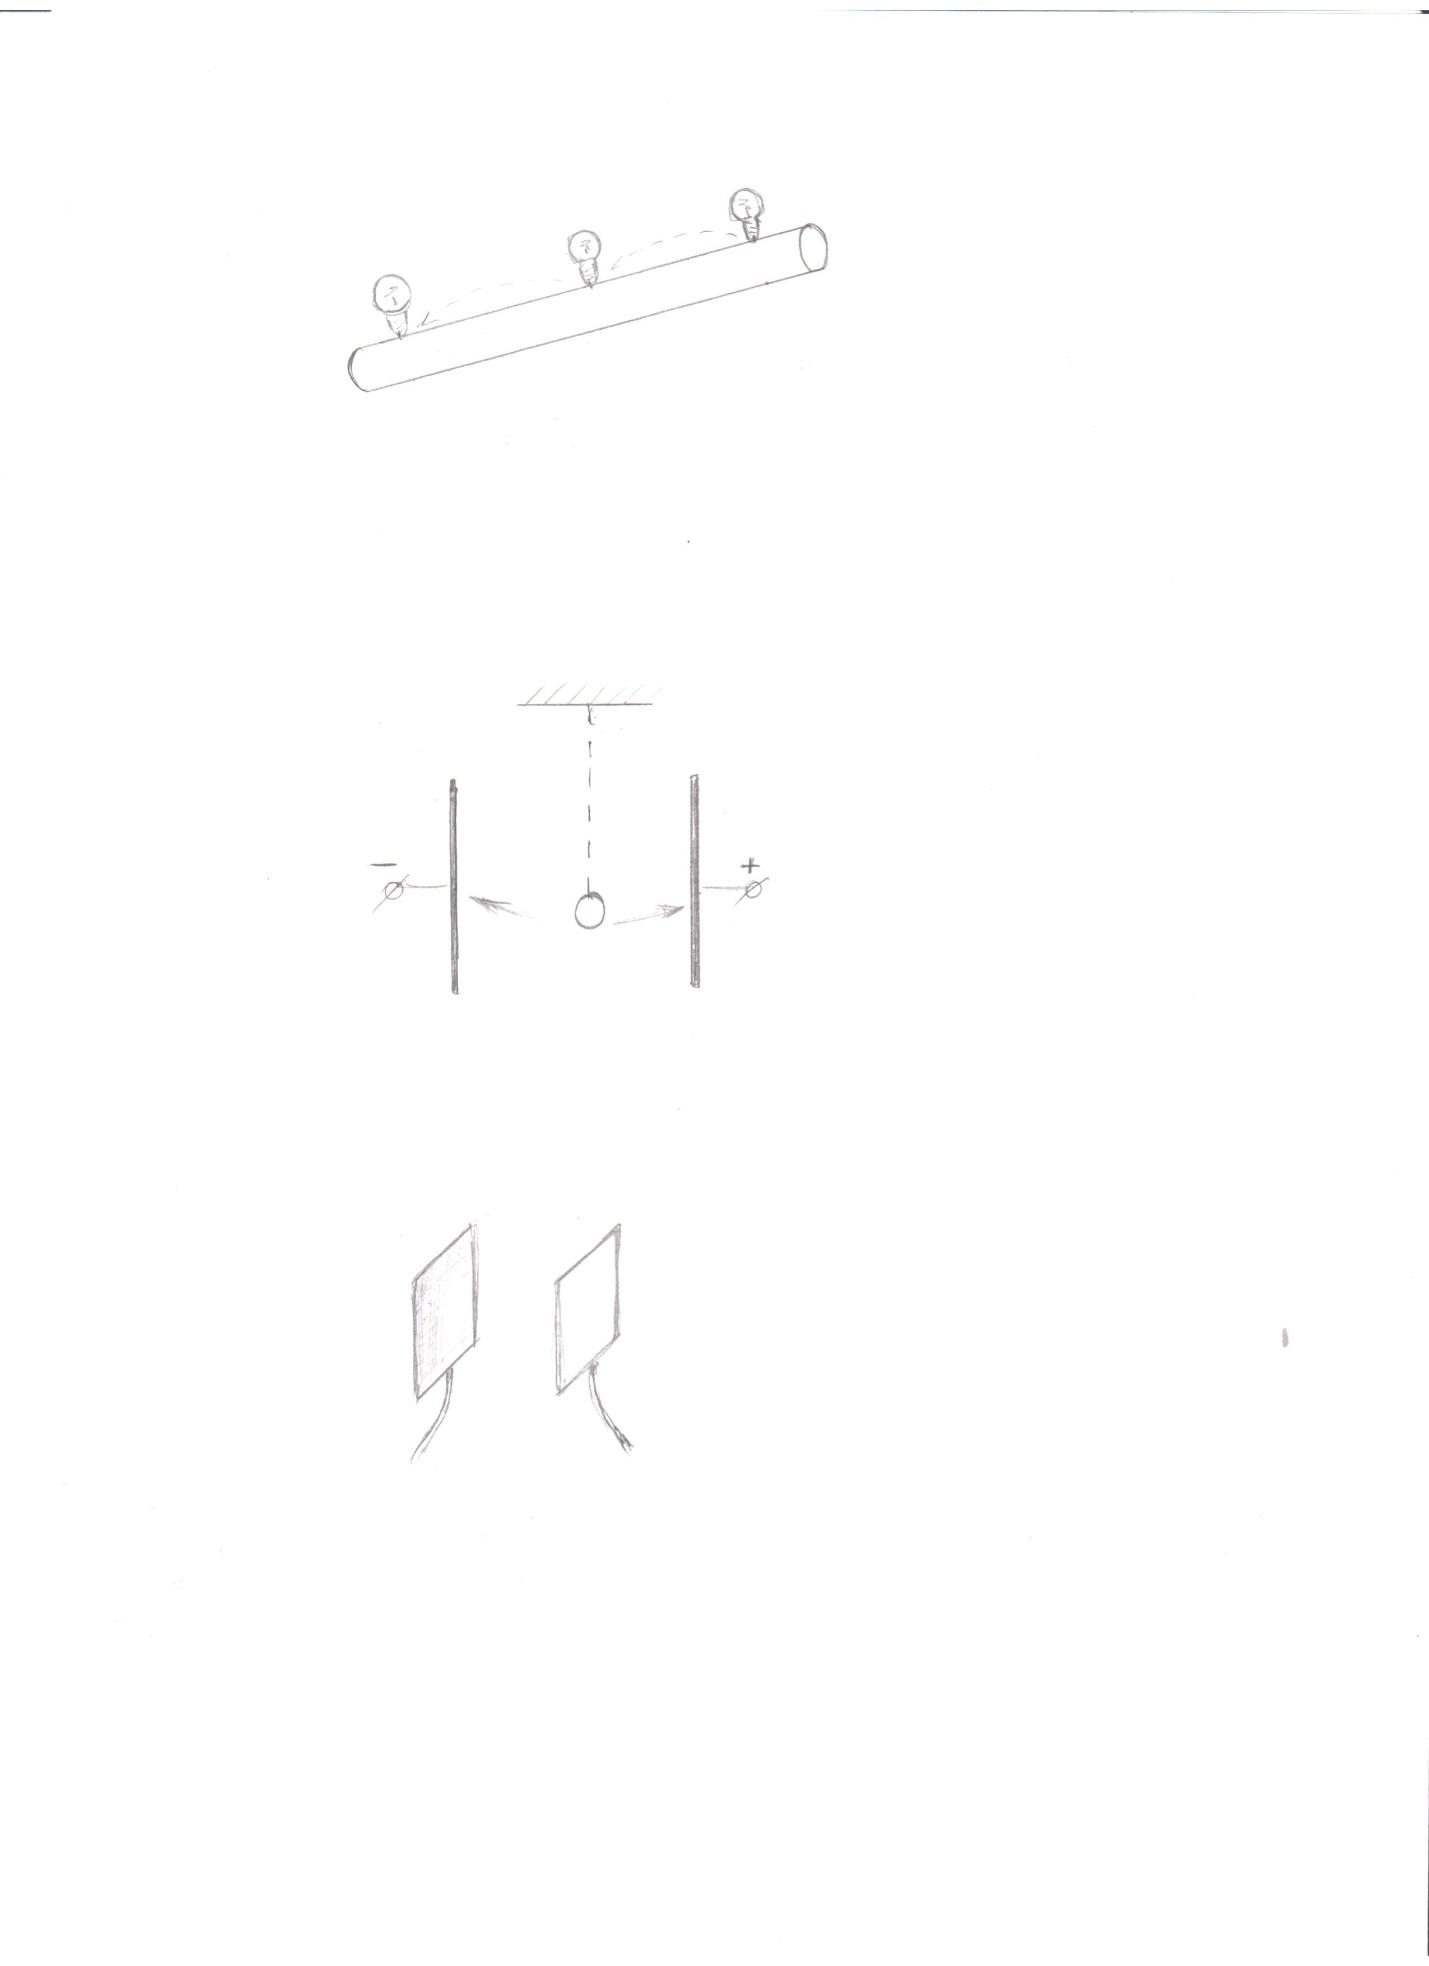 C:\Users\Неверова ЛП\Documents\Scanned Documents\Рисунок (137).jpg